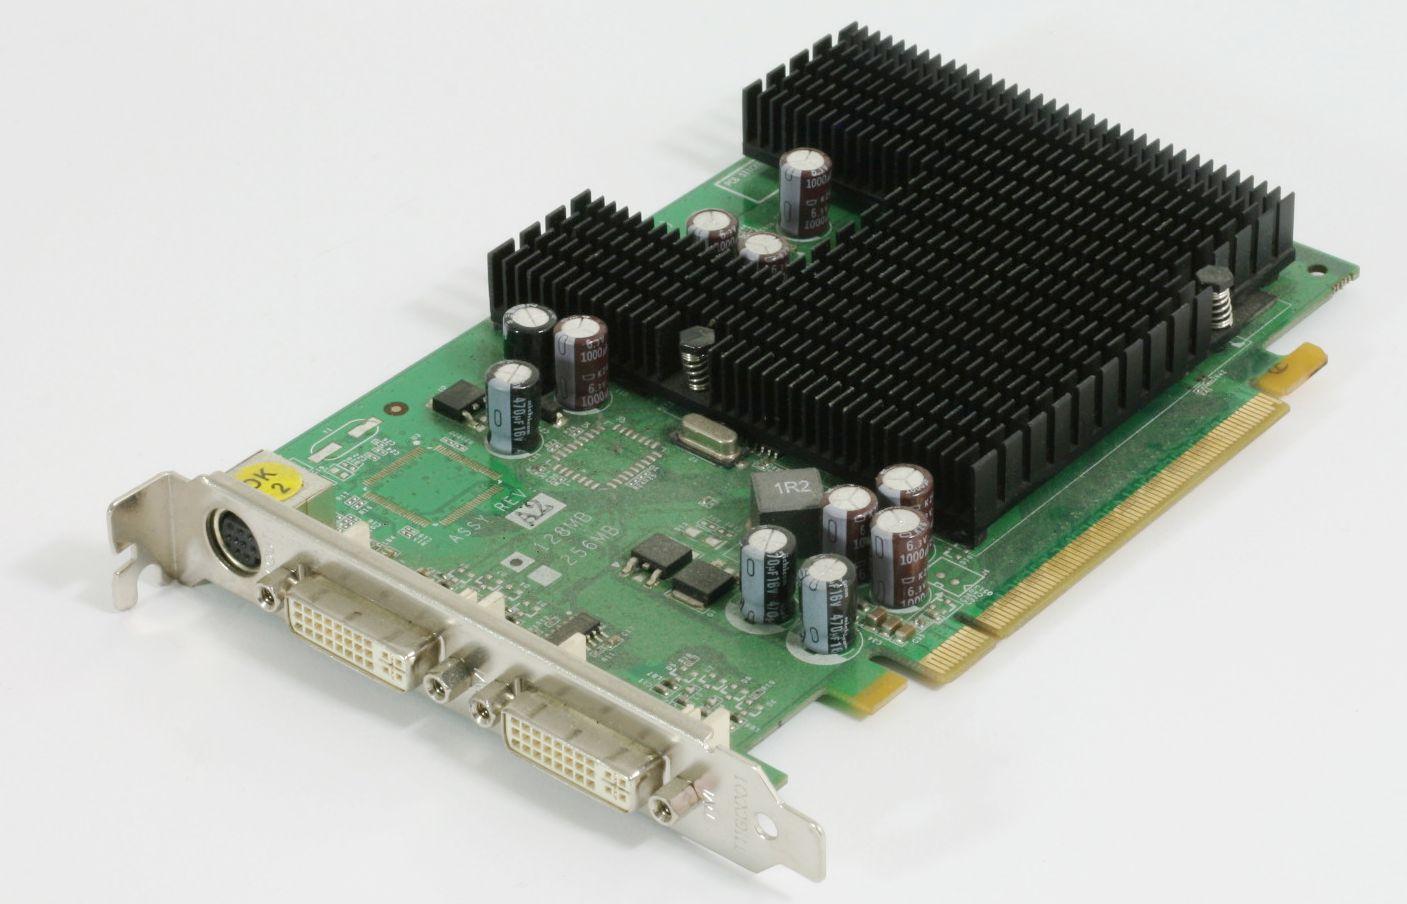 Grafikkarte Fujitsu Nvidia GeForce 7300LE 256MB RAM Dual 2x DVI -I PCIe S-Video